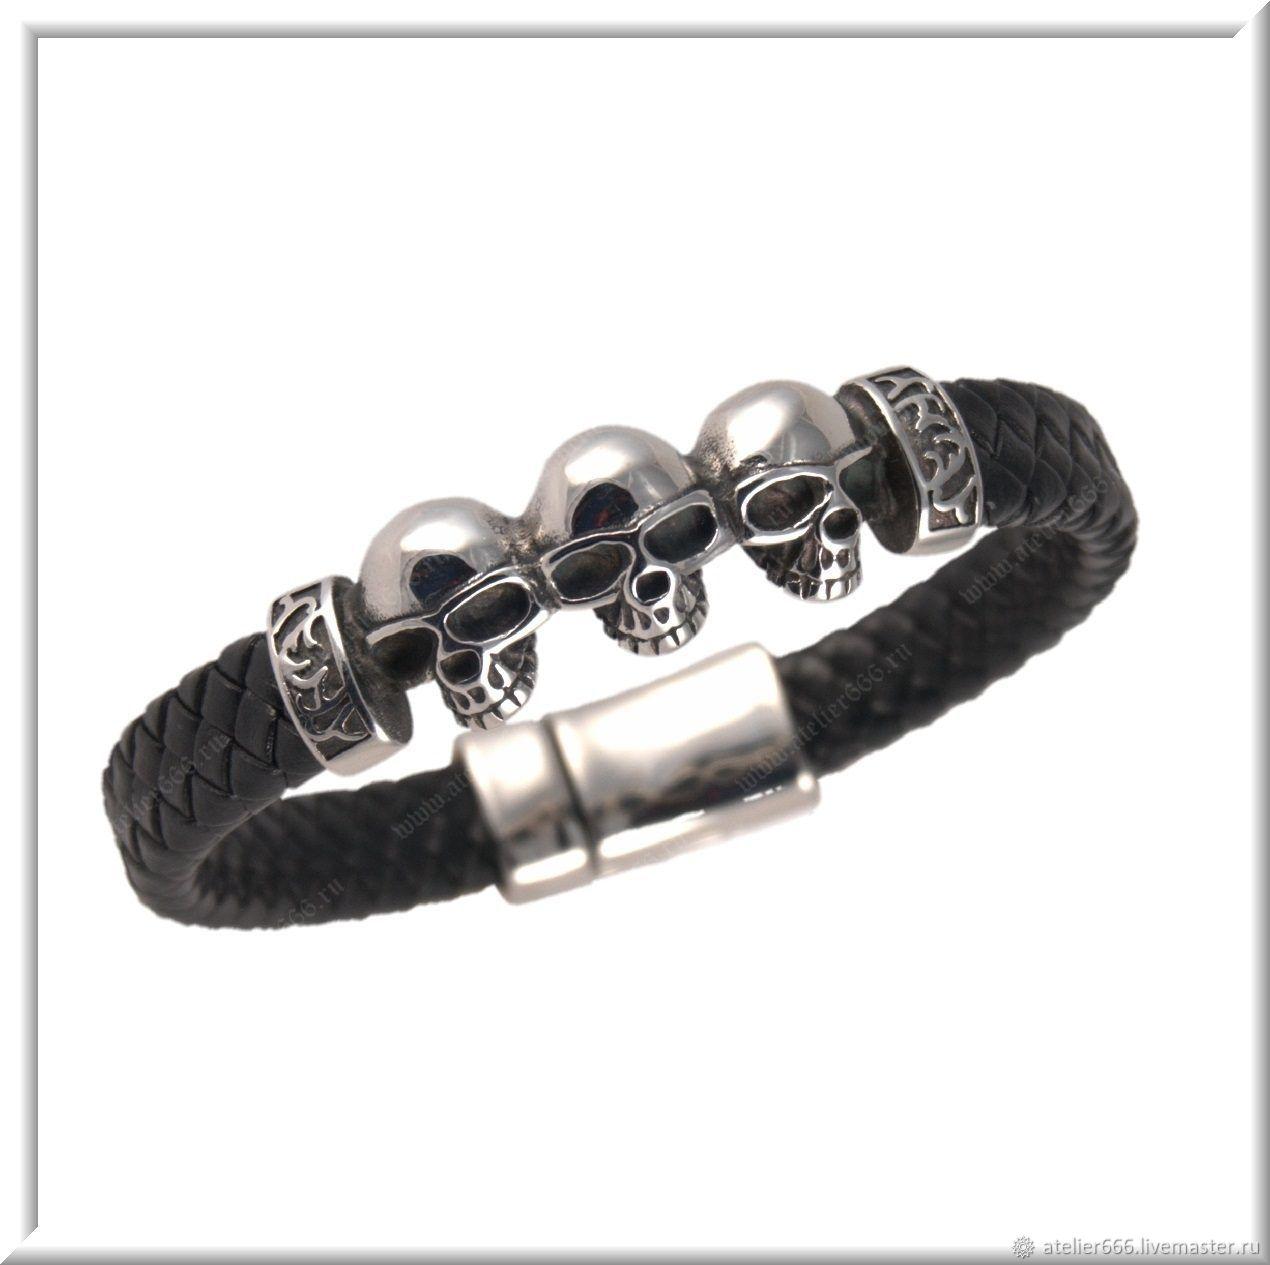 Men's leather bracelet No. 14 accessories steel 316L, Regaliz bracelet, Moscow,  Фото №1